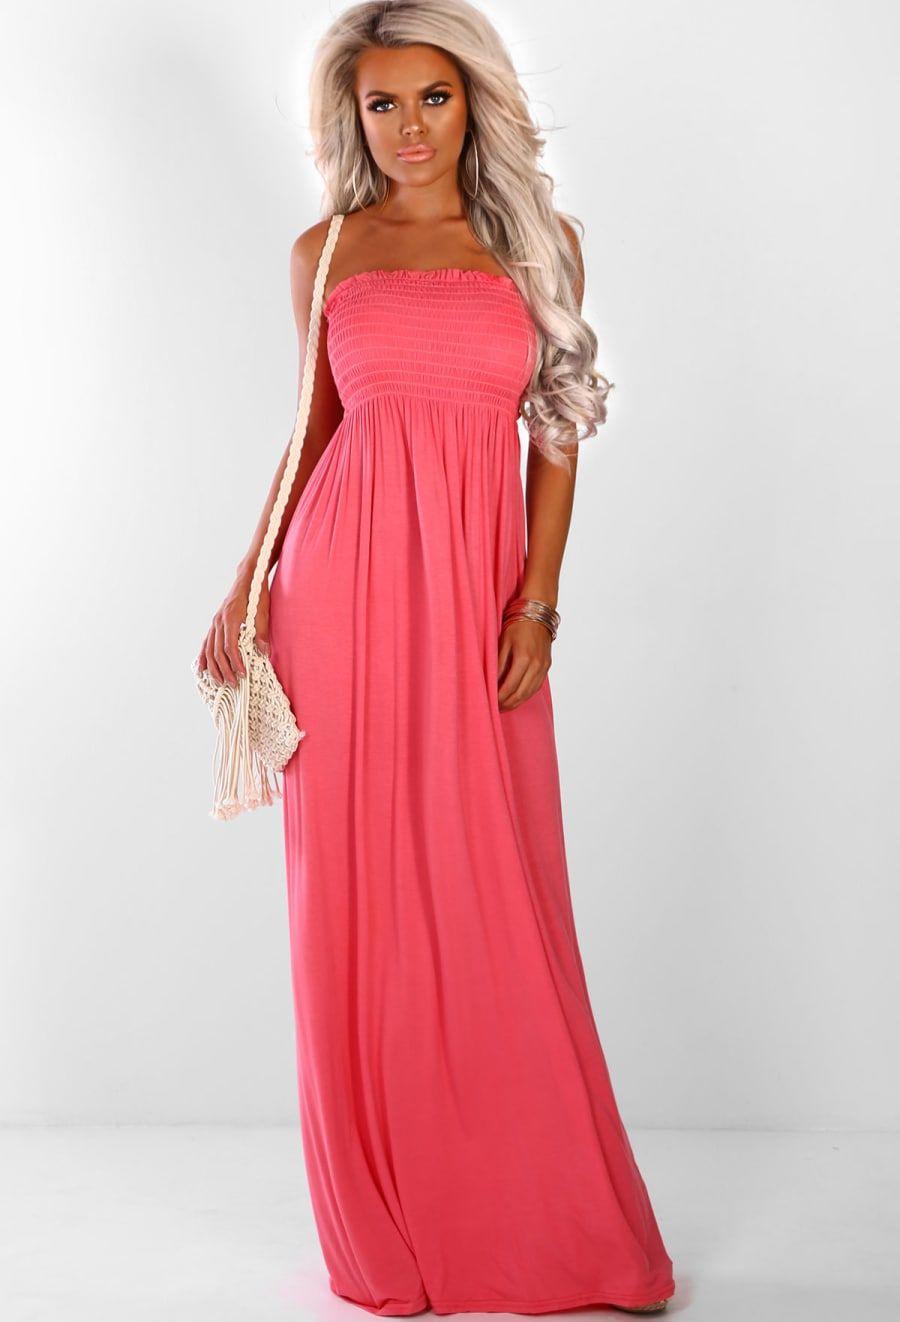 Beach Ready Coral Strapless Jersey Maxi Dress Pink Boutique Maxi Dress Dresses Maxi Jersey Dress [ 1322 x 900 Pixel ]